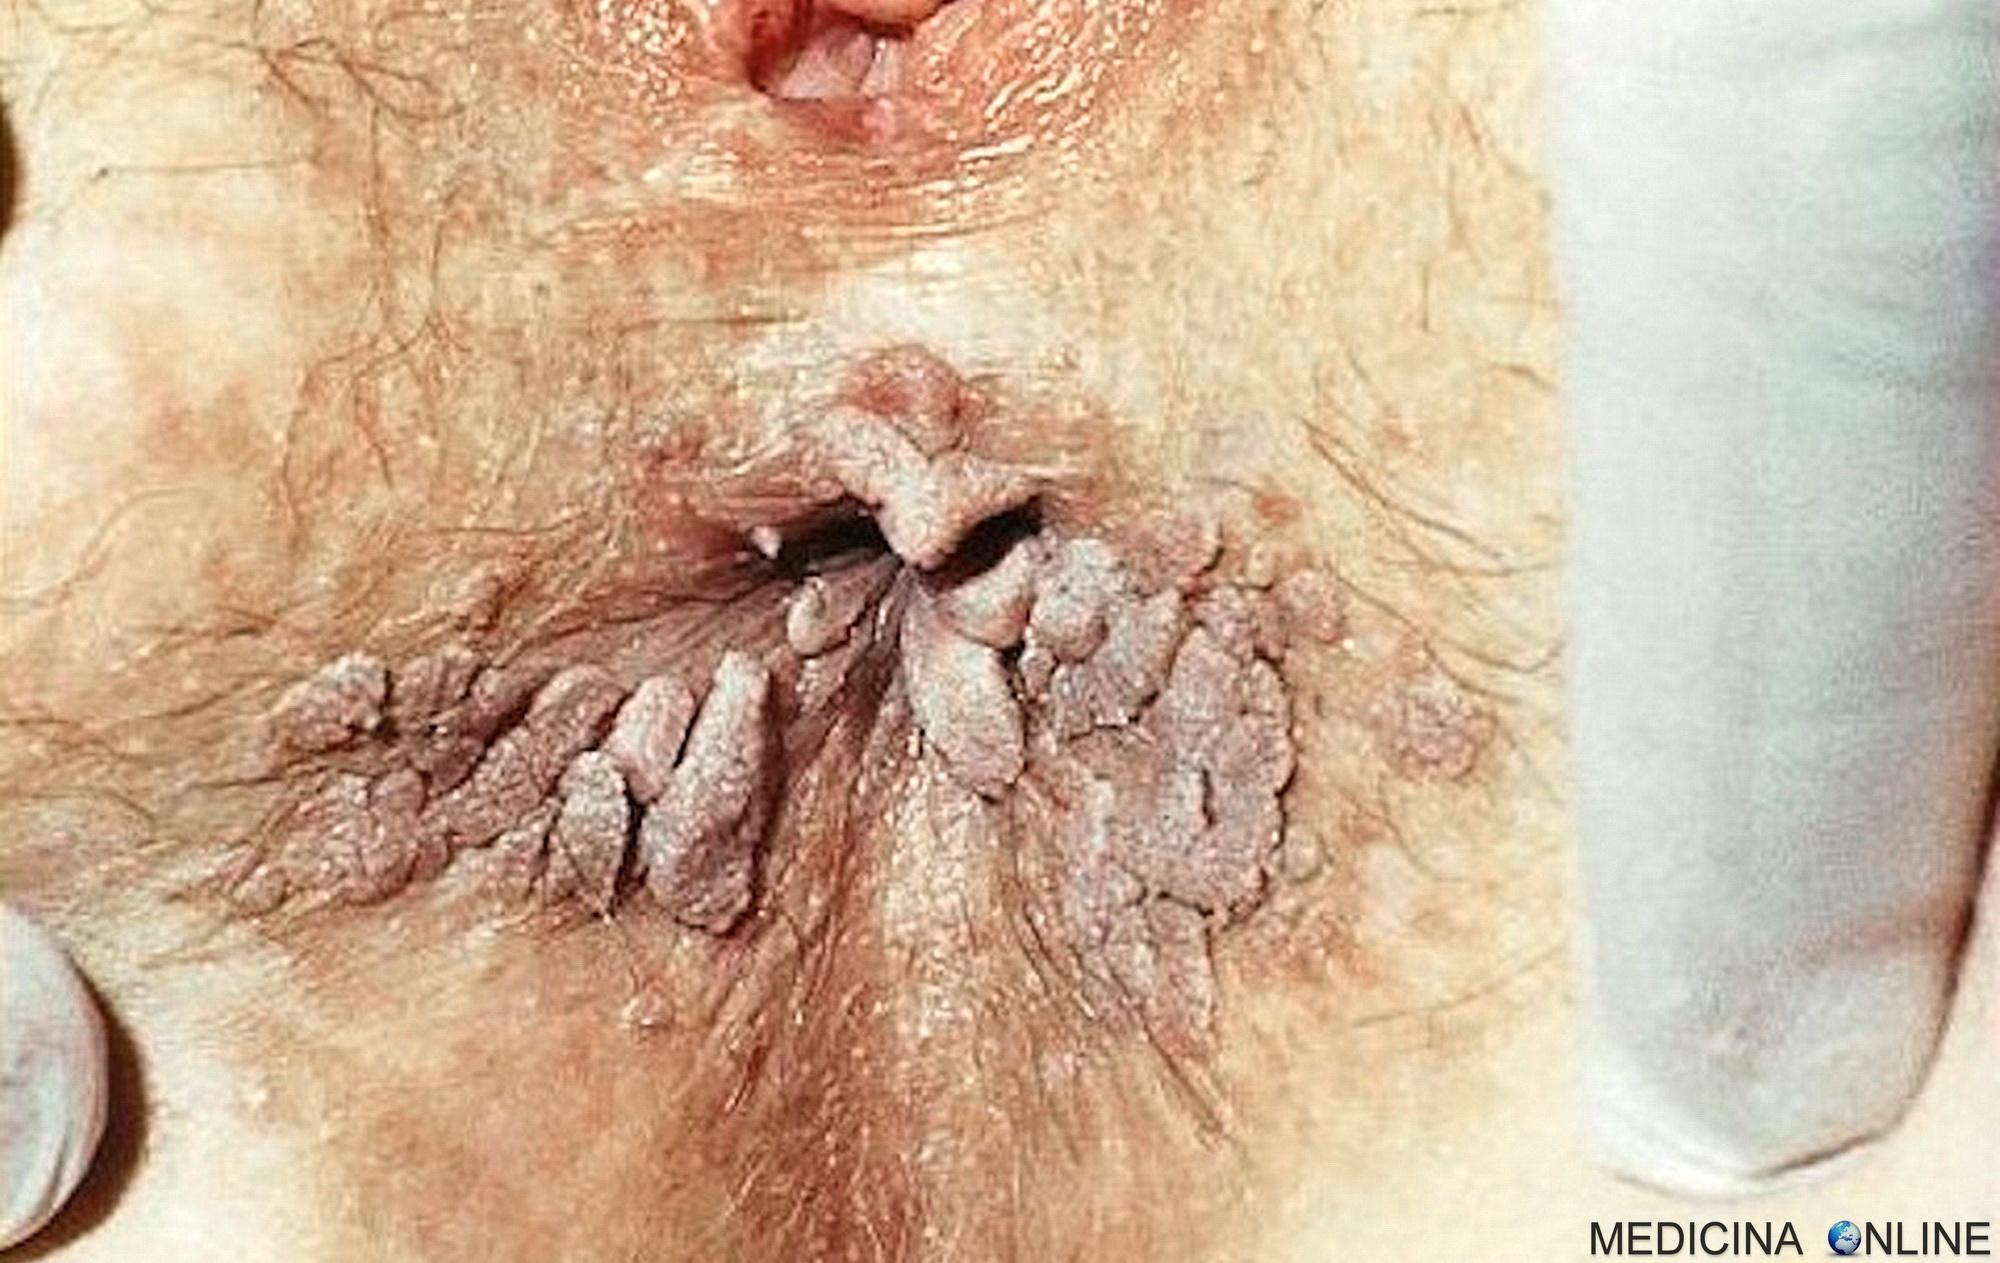 Papilloma virus uomo ano. Papilloma virus uomo recidive